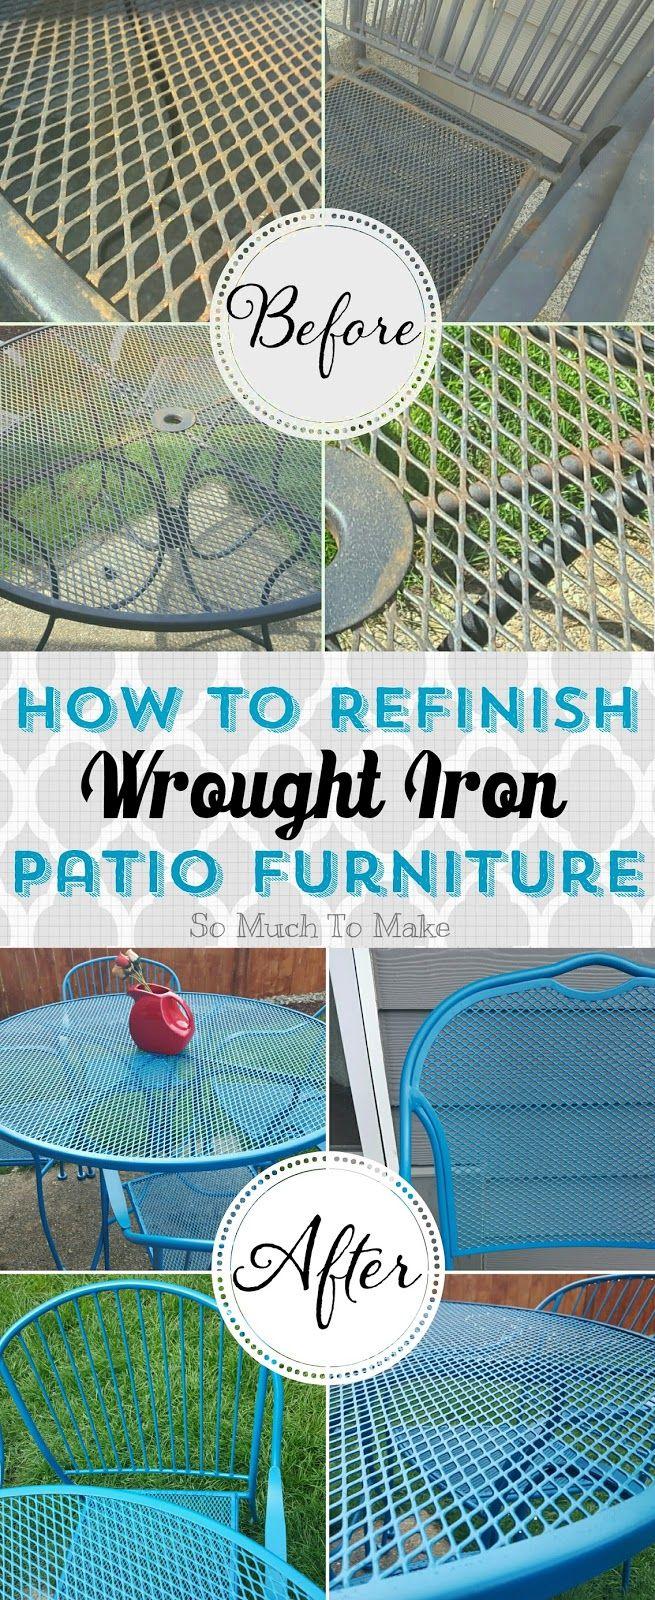 How To Refinish Wrought Iron Patio Furniture Iron Patio